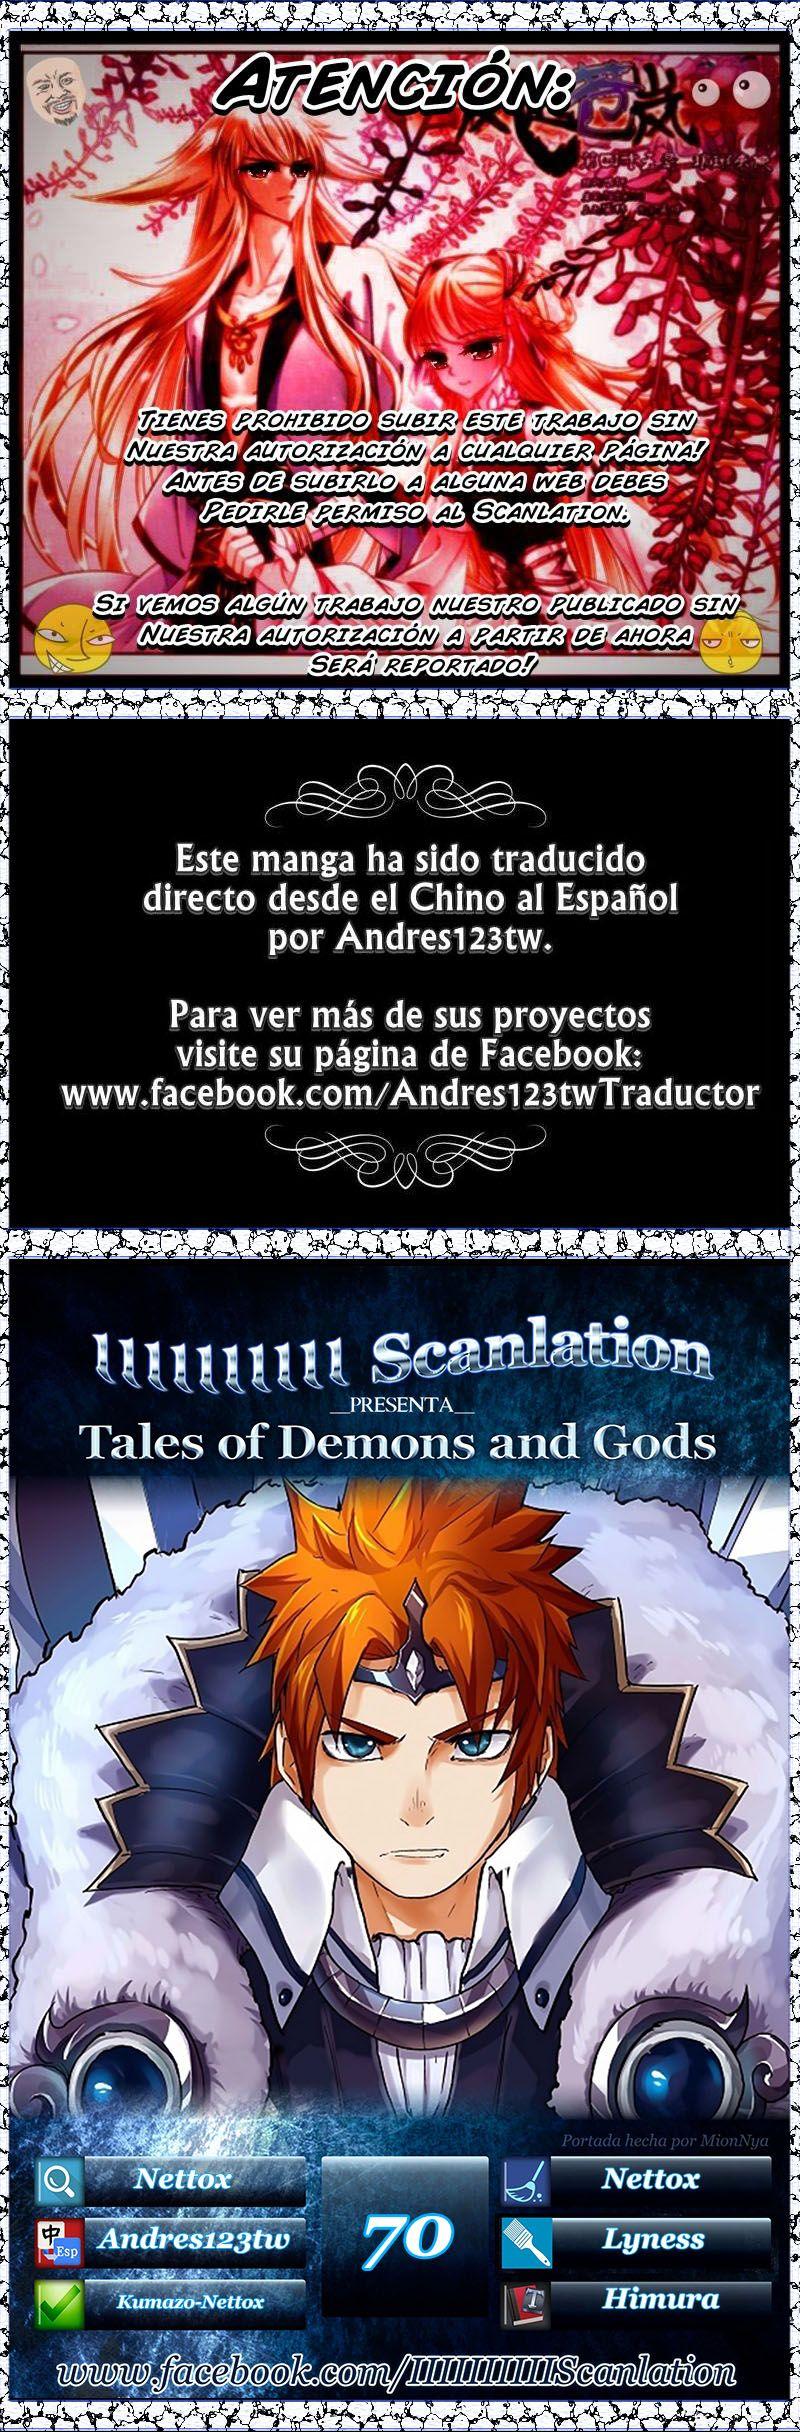 http://c5.ninemanga.com/es_manga/7/17735/457026/211cbc6c7d410d6372ec40eda30e8baa.jpg Page 1